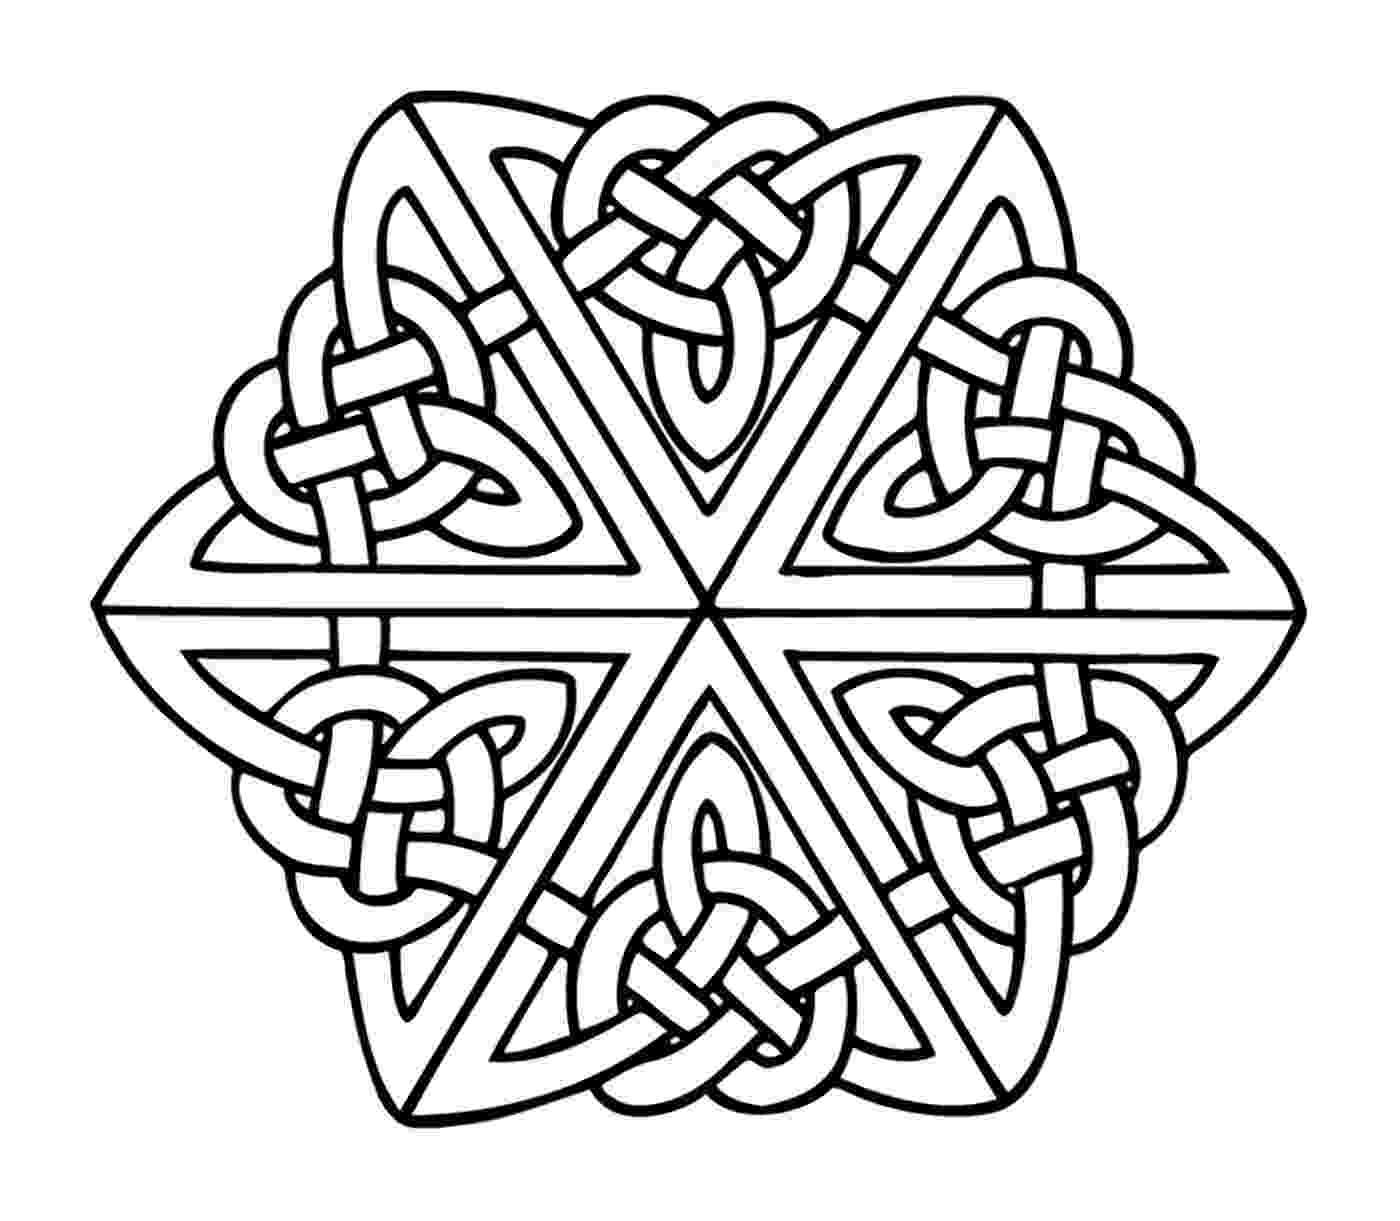 celtic art colouring pages celtic mandala 1 simple mandalas 100 mandalas zen colouring celtic pages art